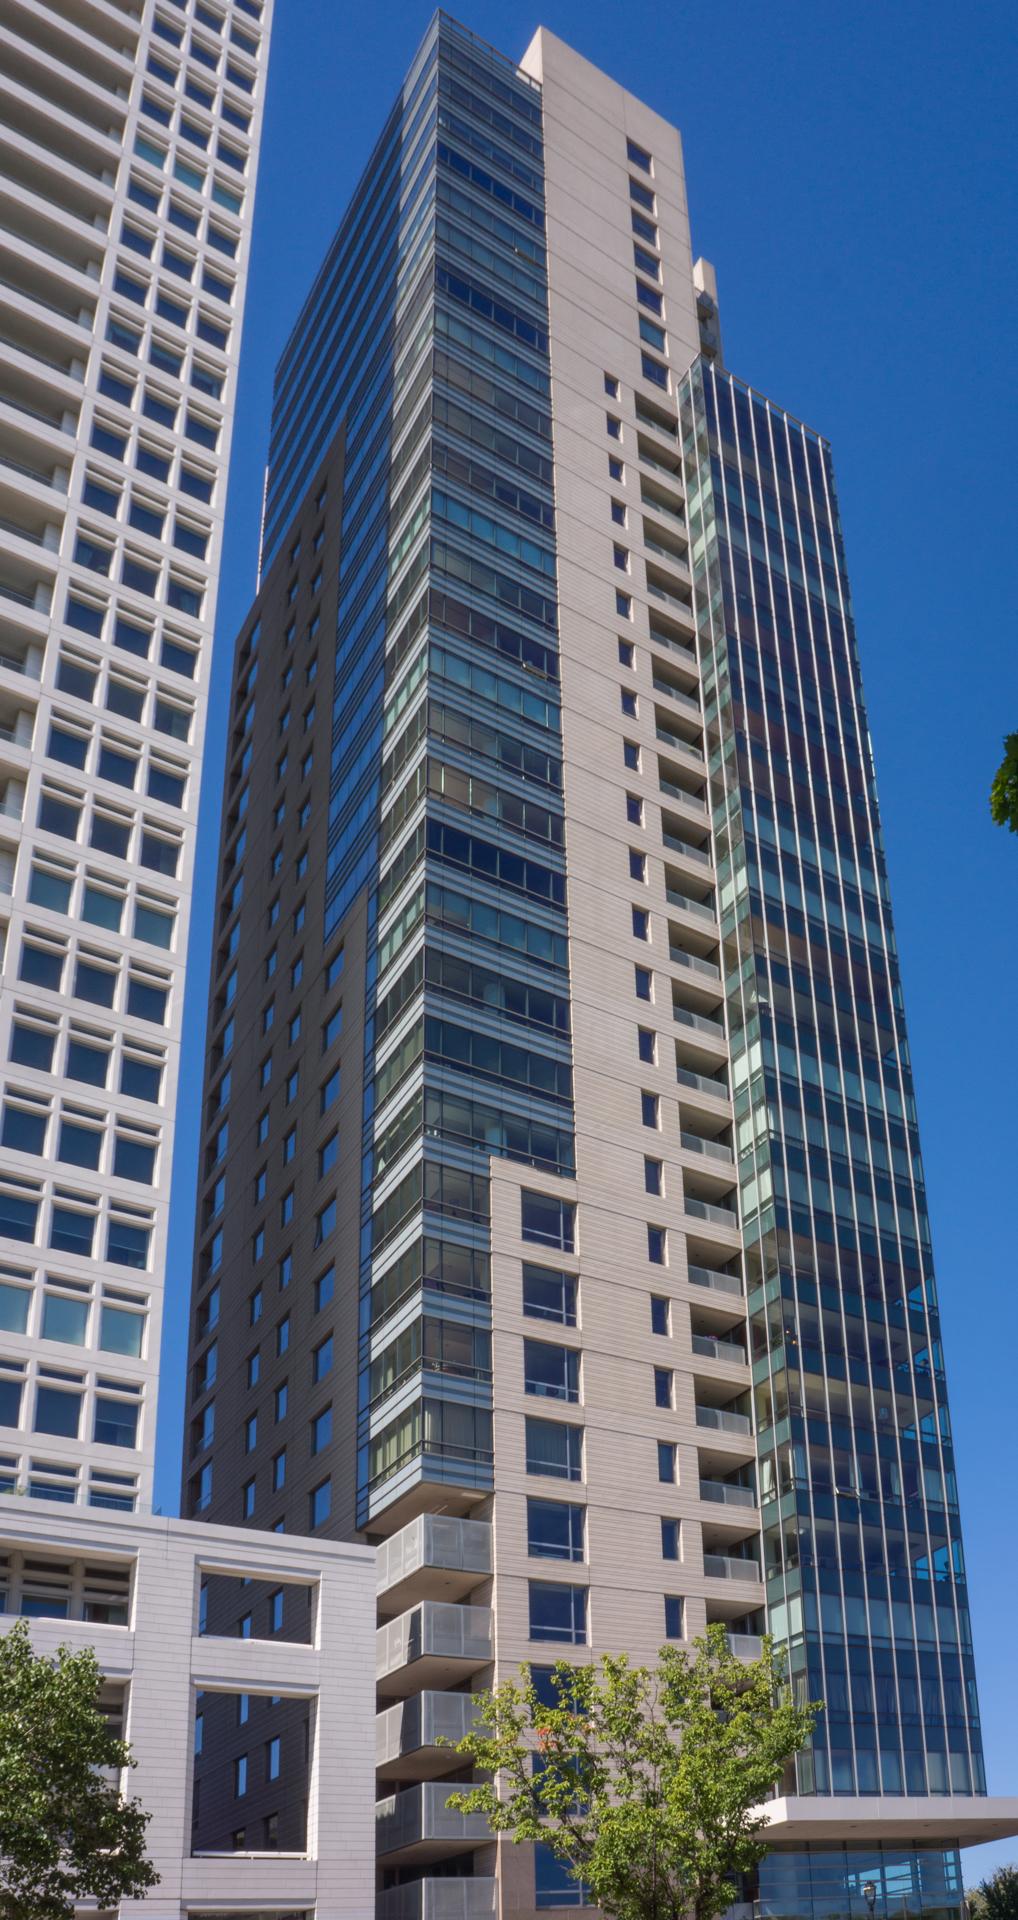 Kilbourn Tower - Milwaukee, WI